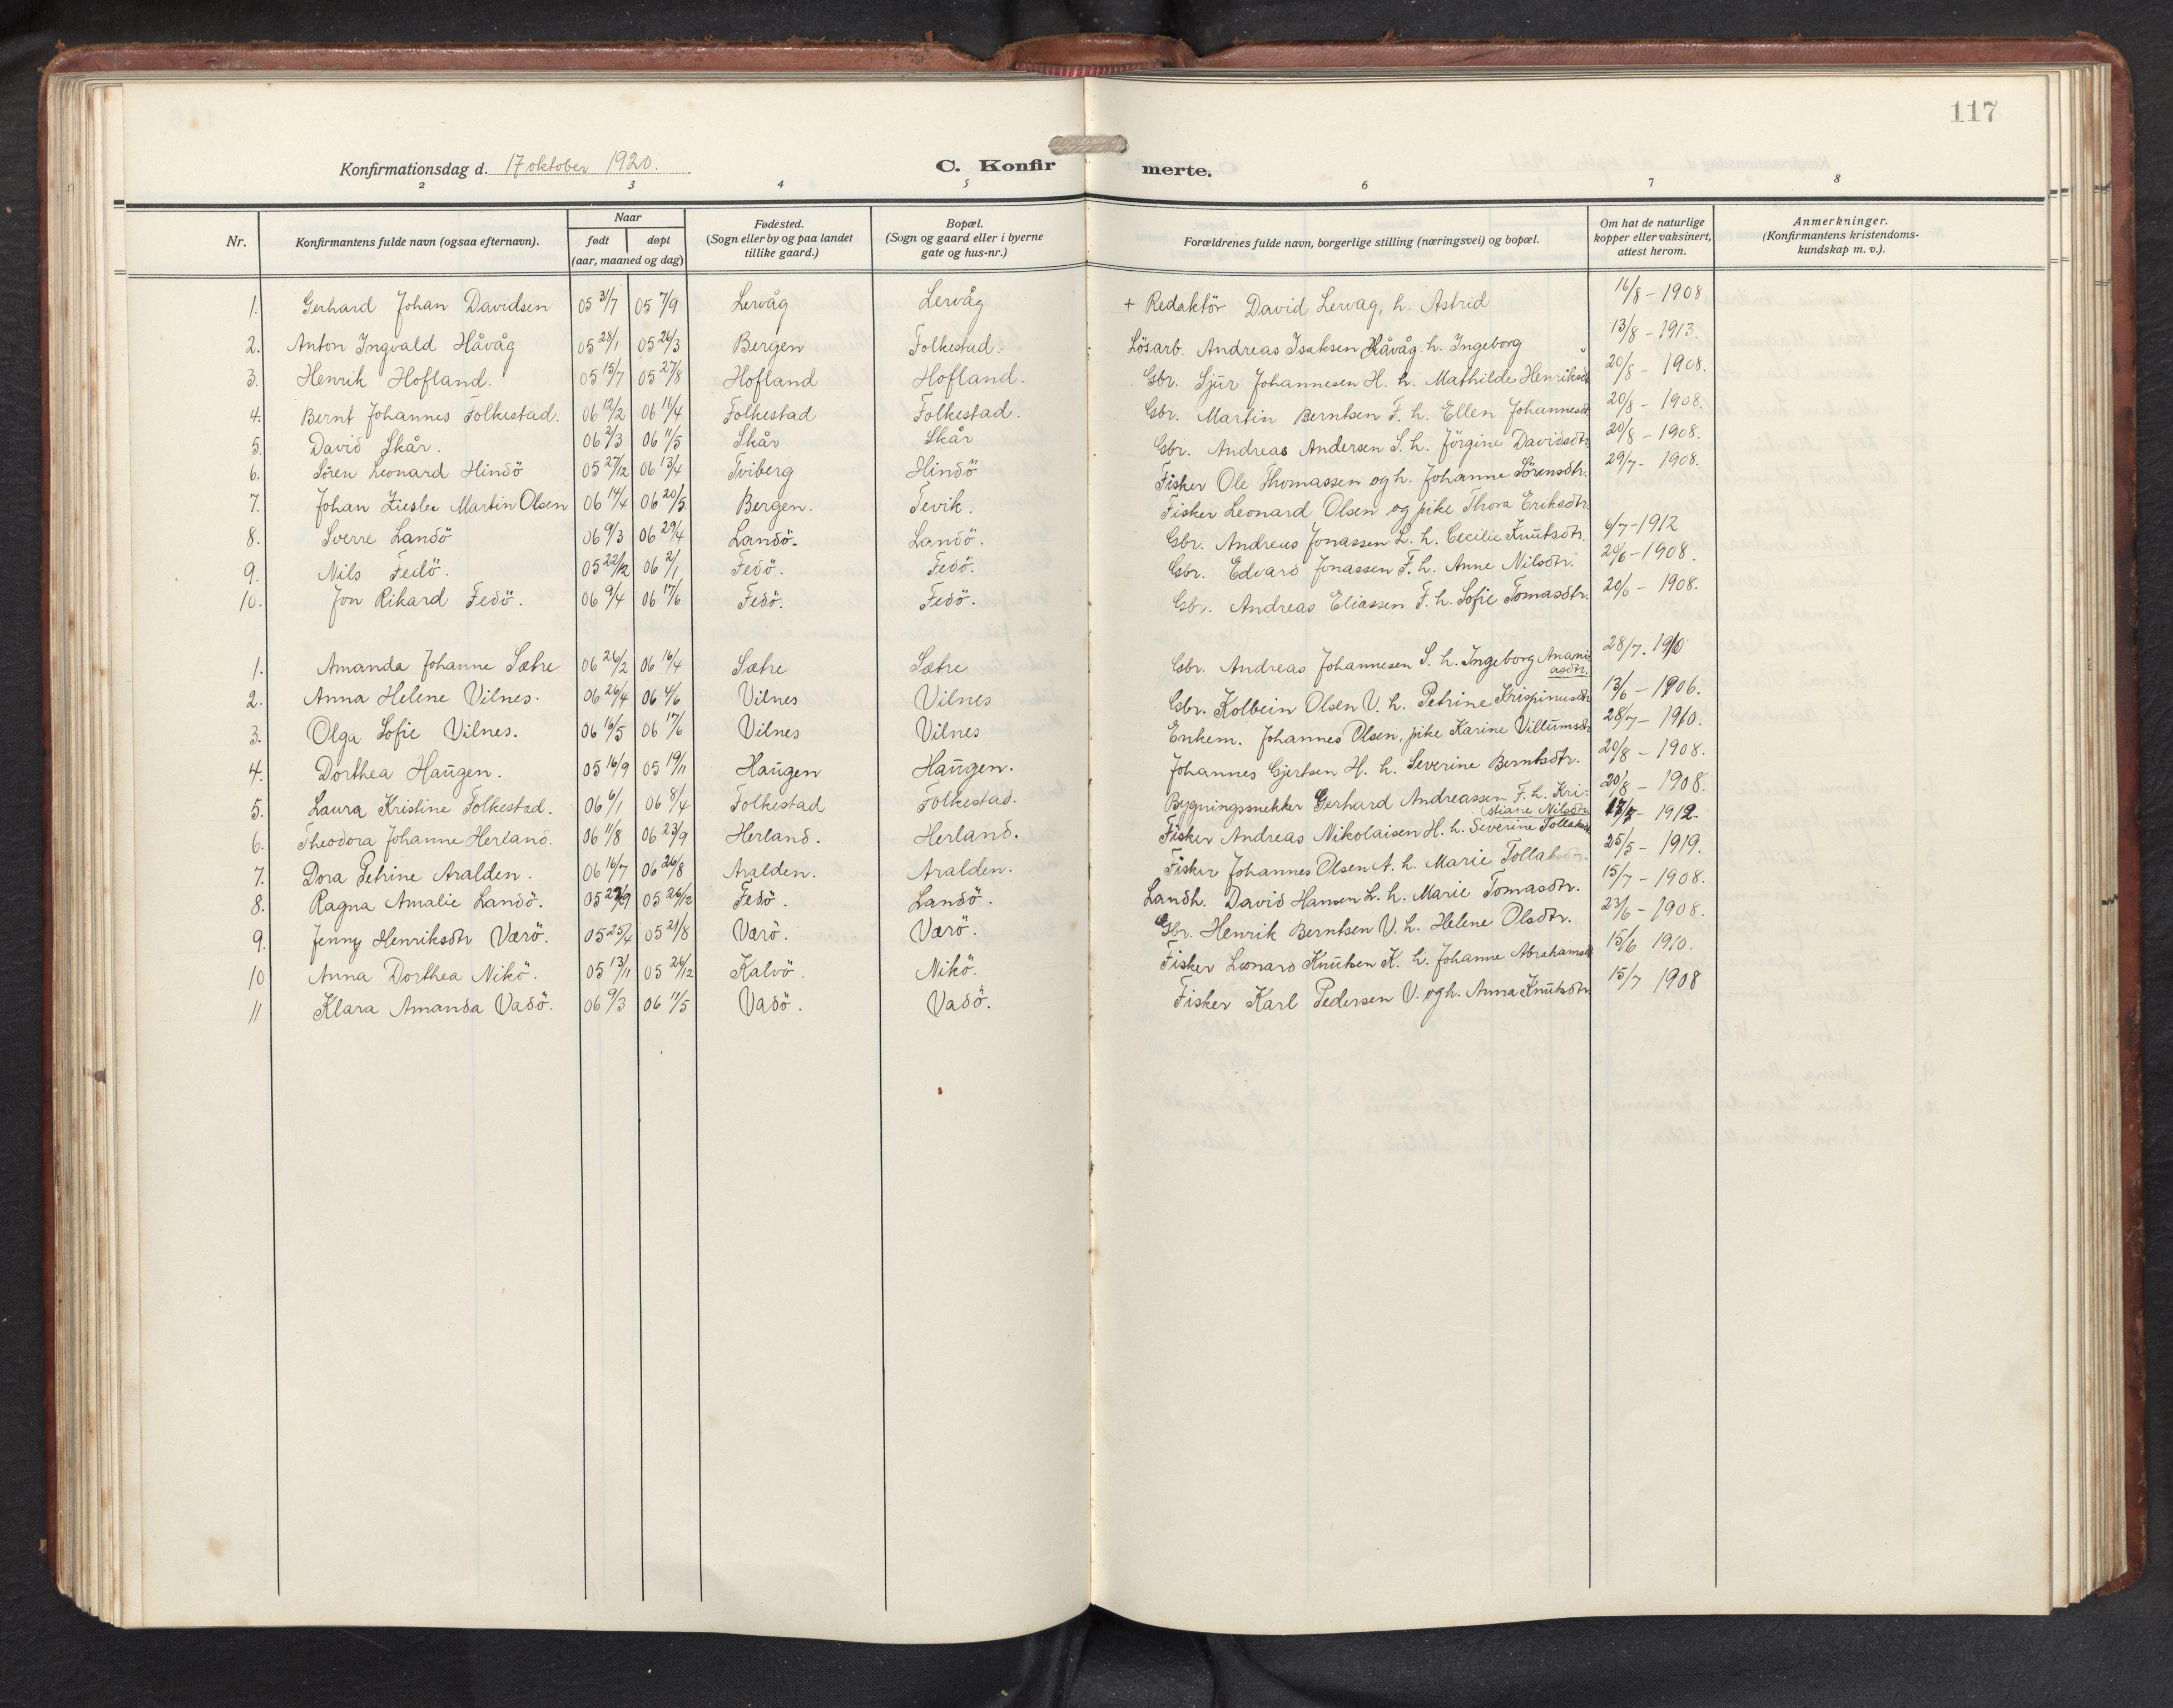 SAB, Askvoll sokneprestembete, H/Hab/Habb/L0002: Klokkerbok nr. B 2, 1910-1947, s. 116b-117a